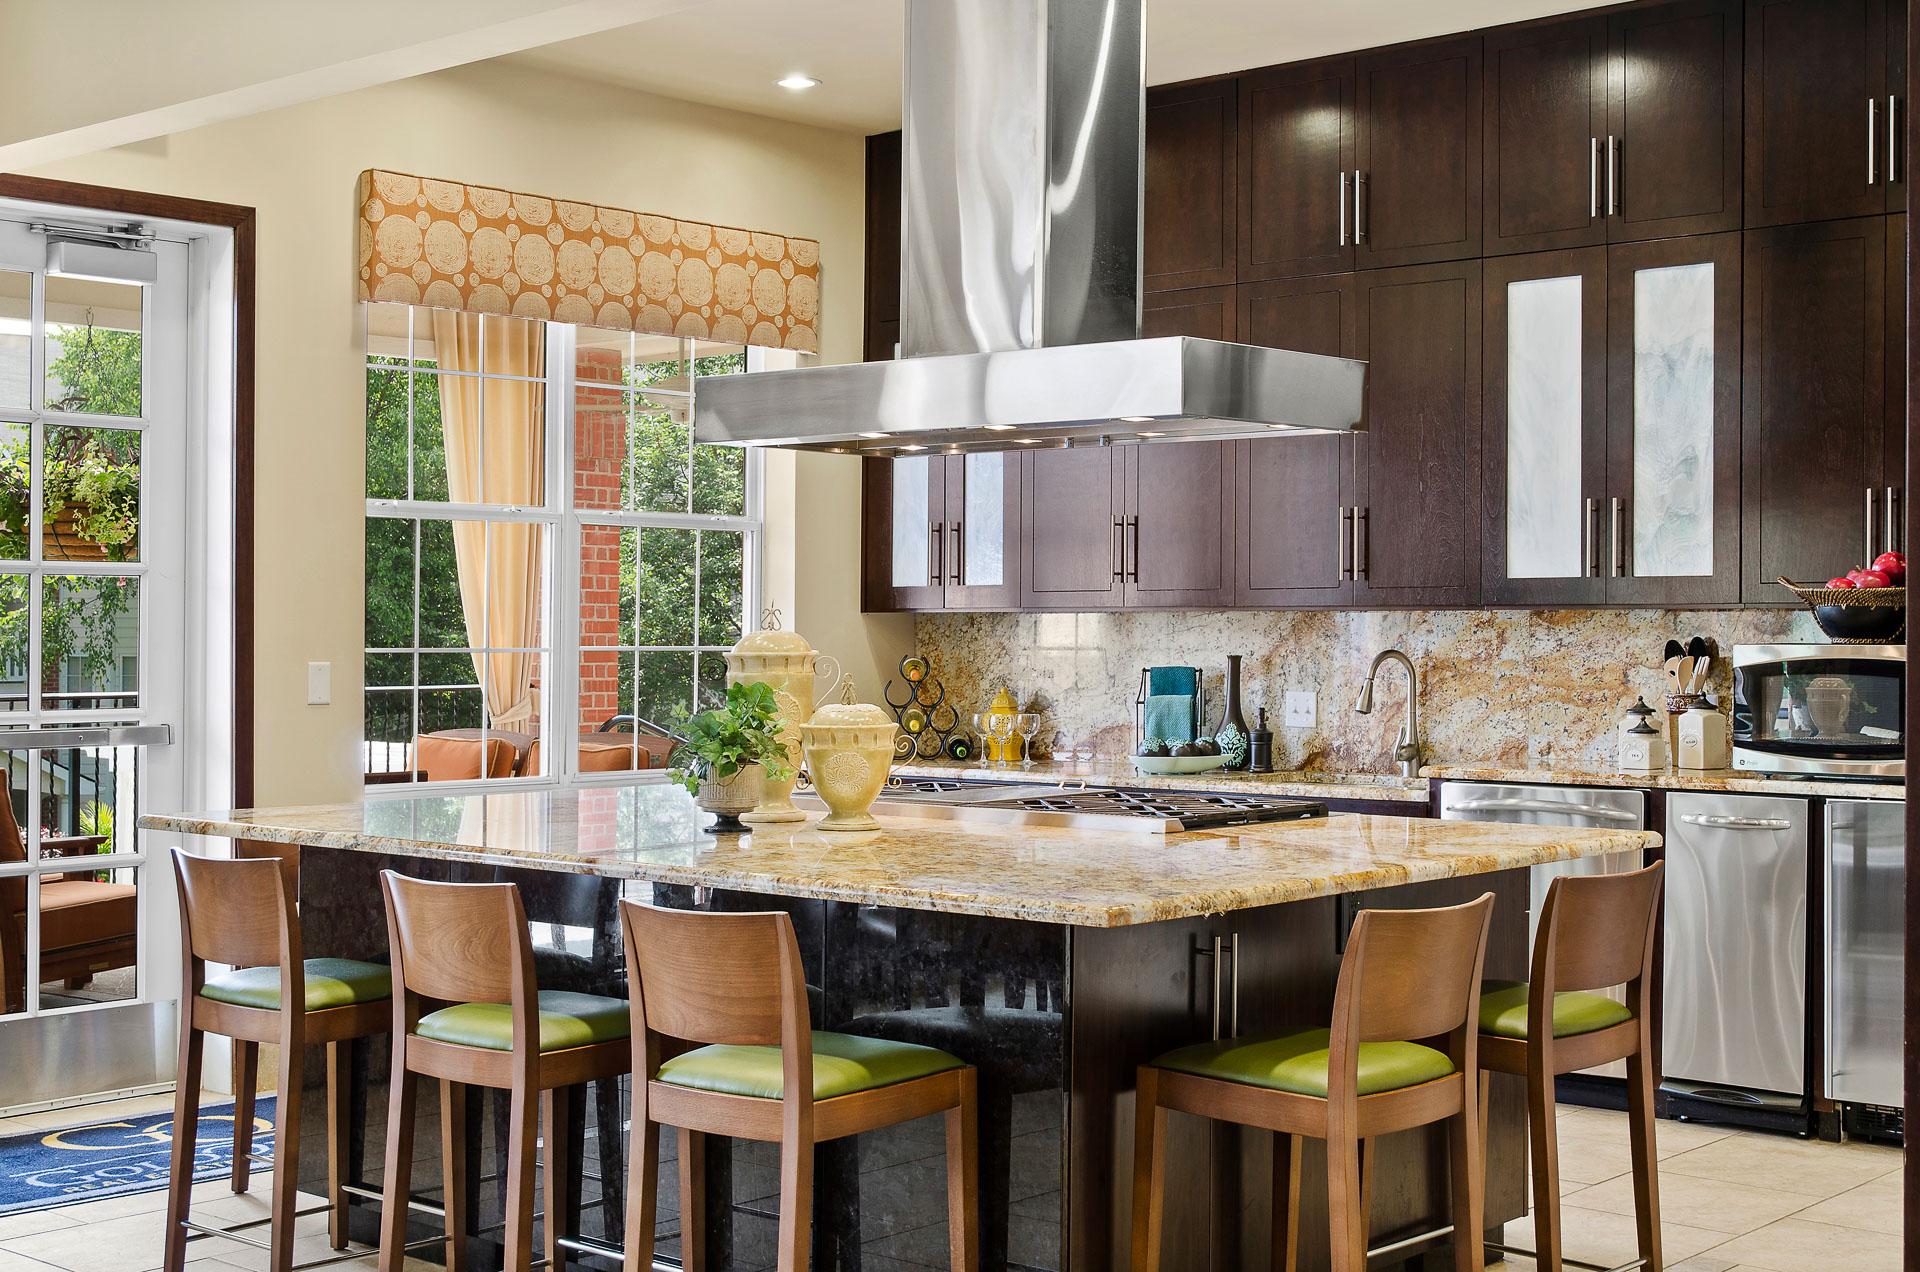 Sherpa Media Kansas City - Apartments & Multi-Family Housing - 16